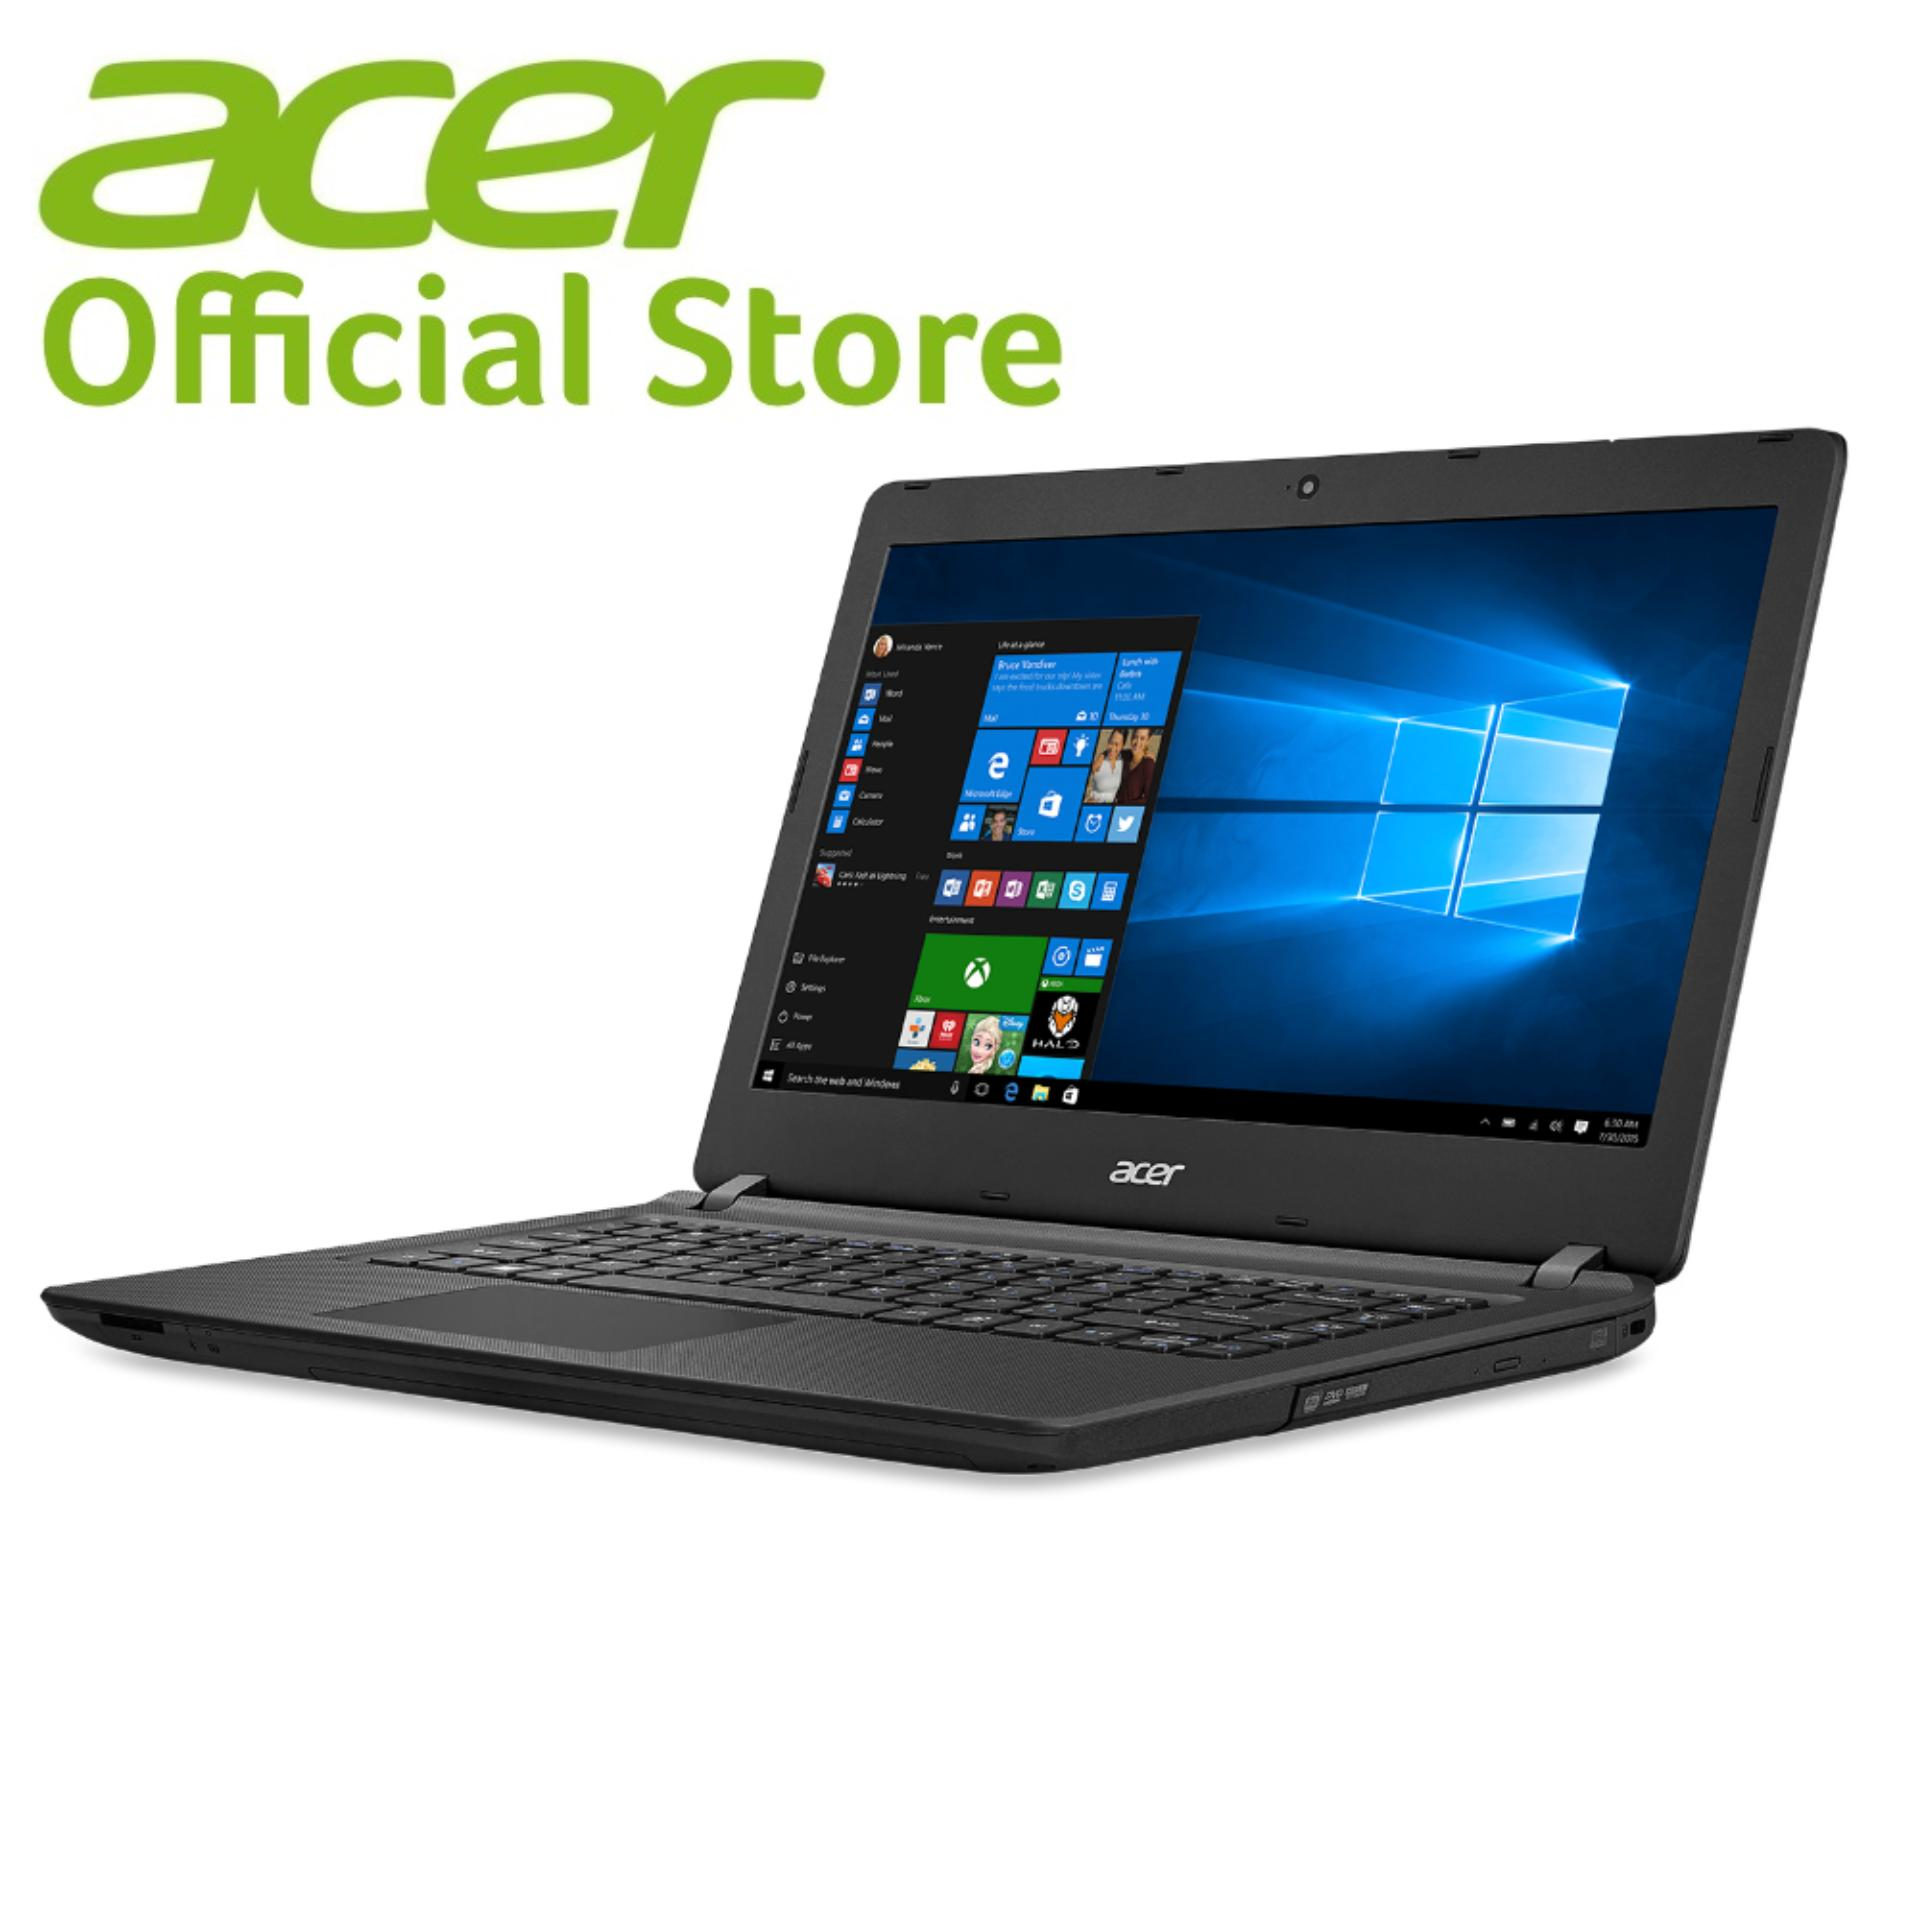 Acer Aspire ES14 (ES1-432-C8P1) – 14″/Celeron N3350/4GB/1TB/DVDRW/W10 (Black)